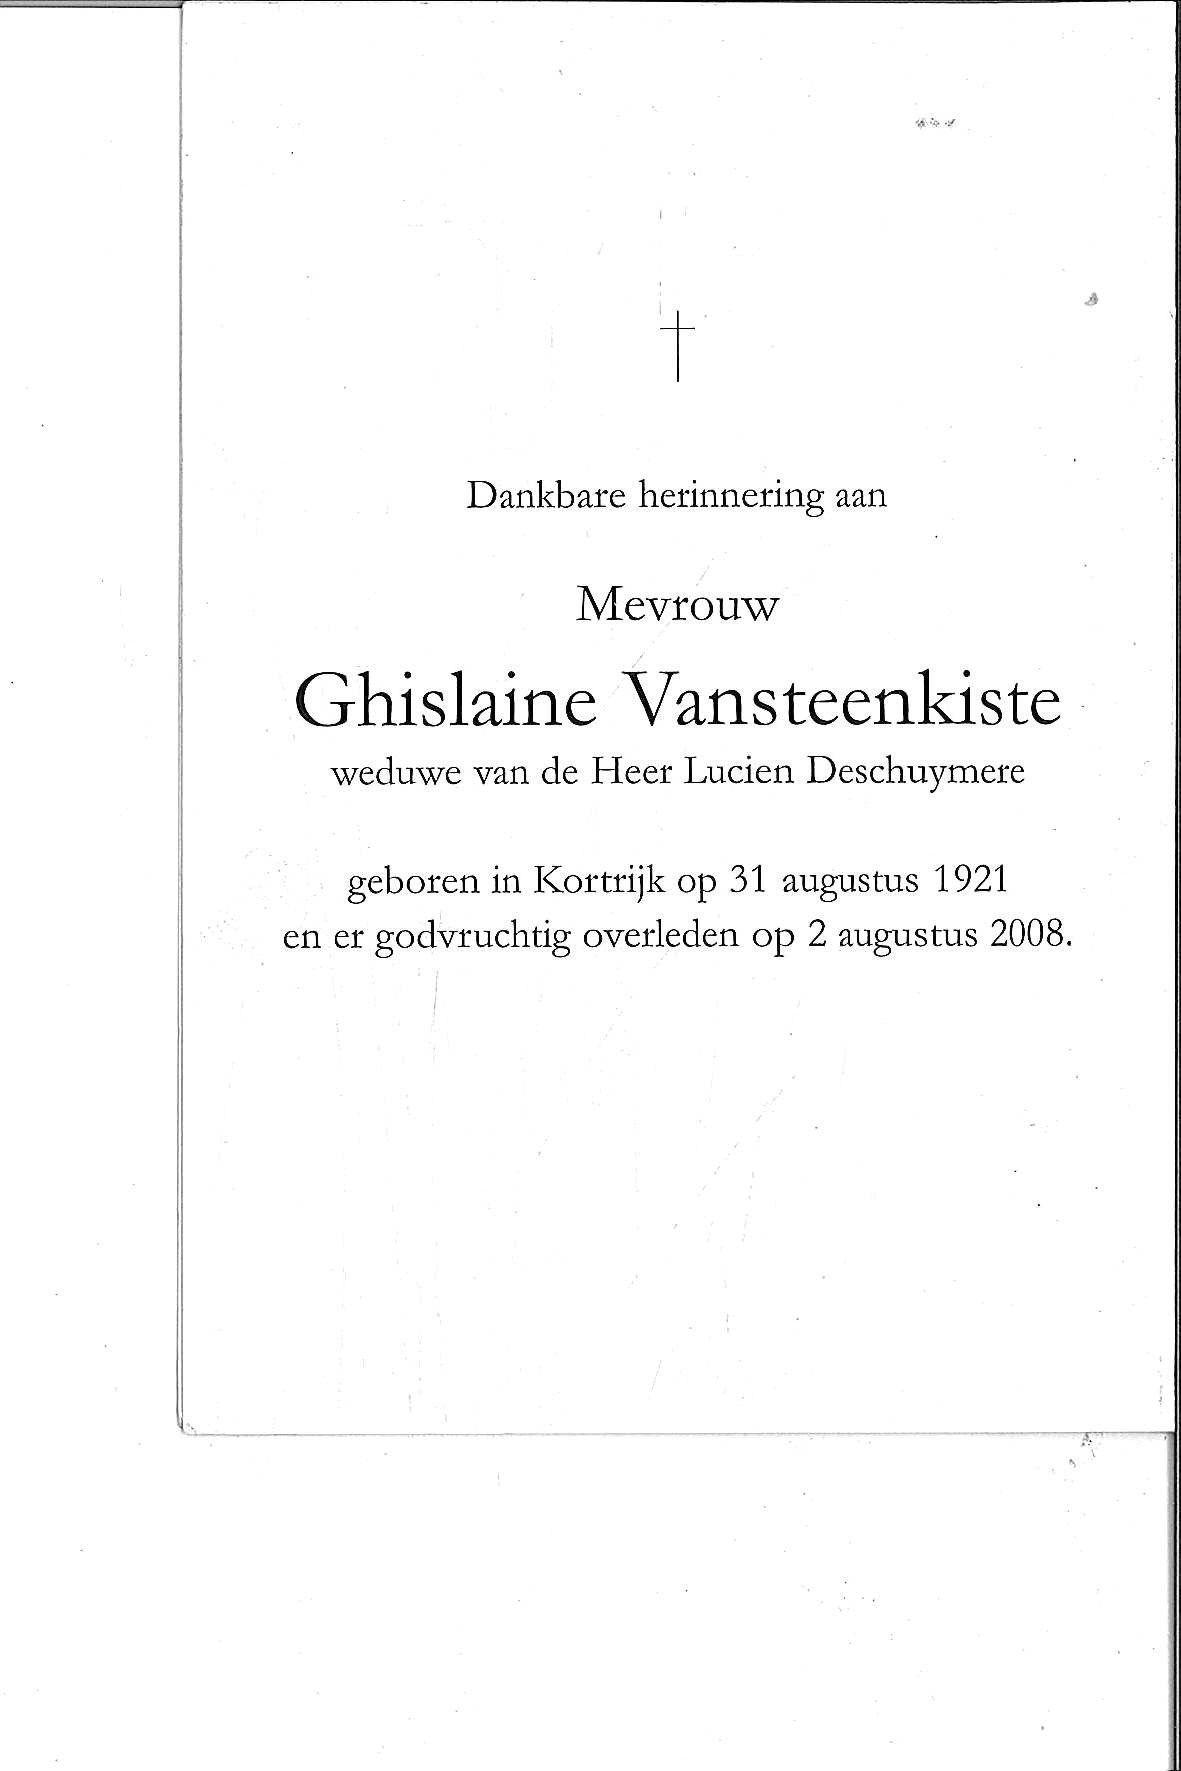 Ghislaine(2008)20150707085005_00035.jpg